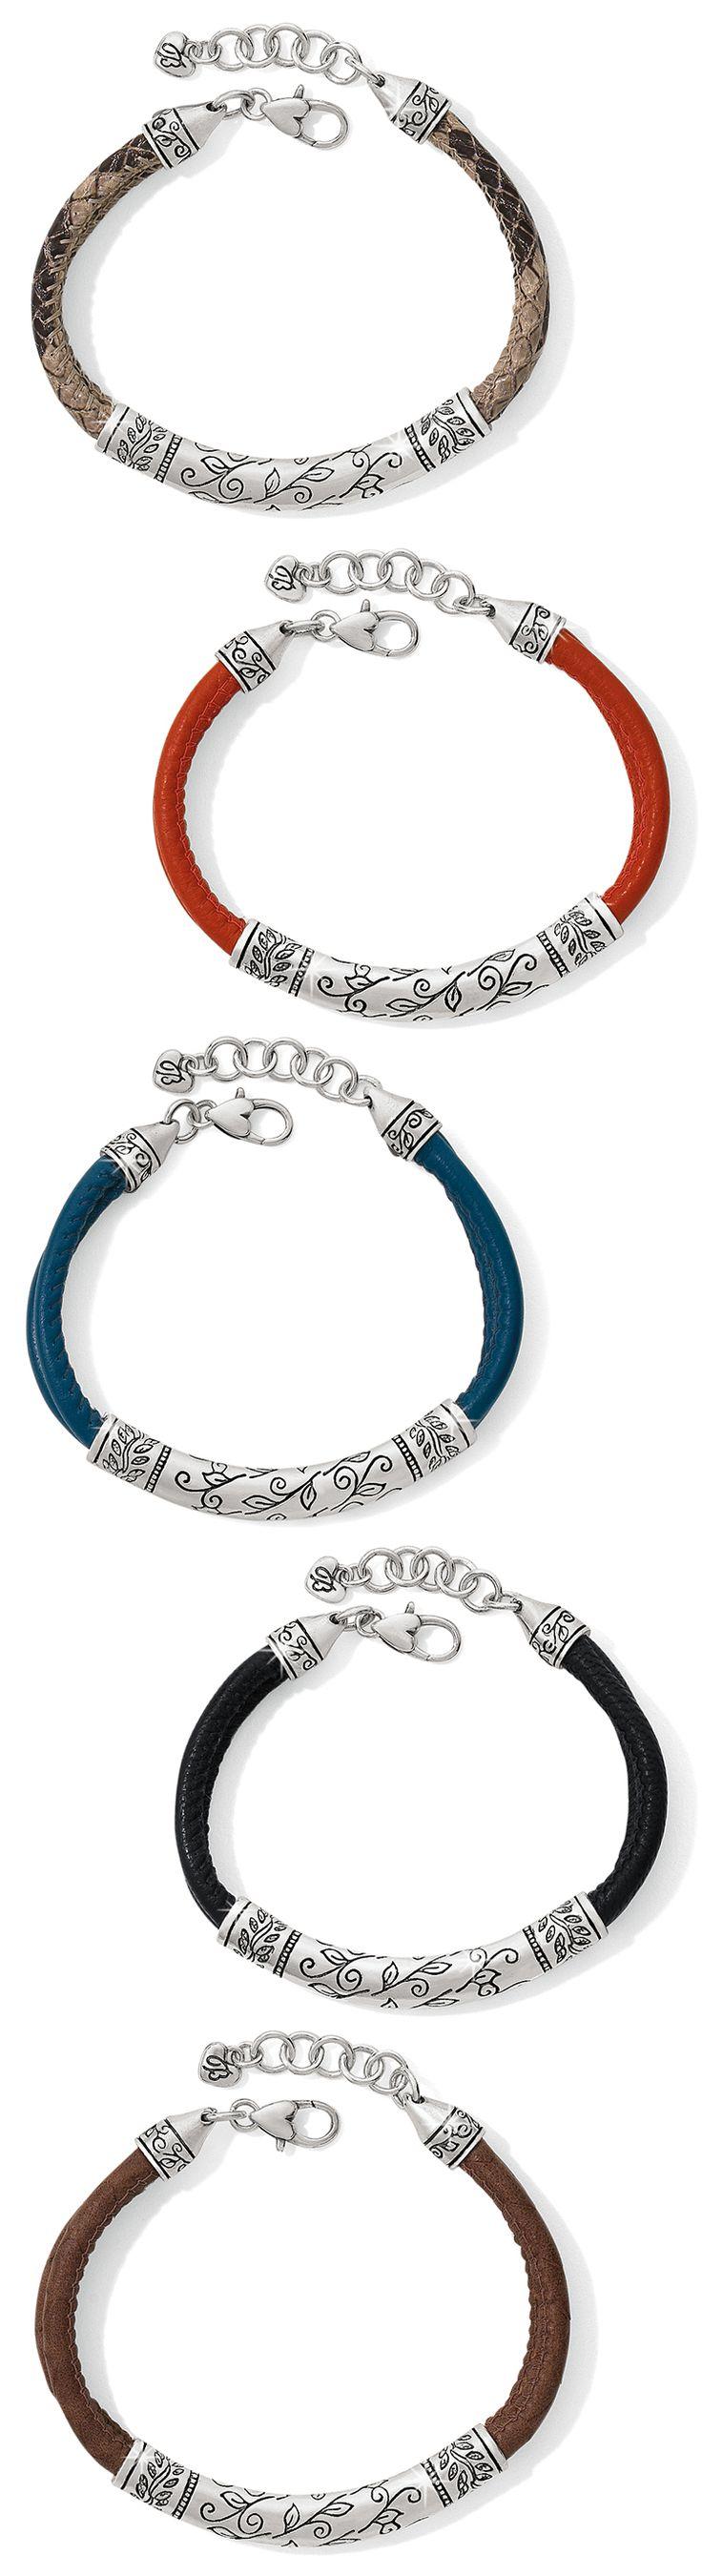 Brighton Glastonbury Leather Bracelets #BrightonCollectibles